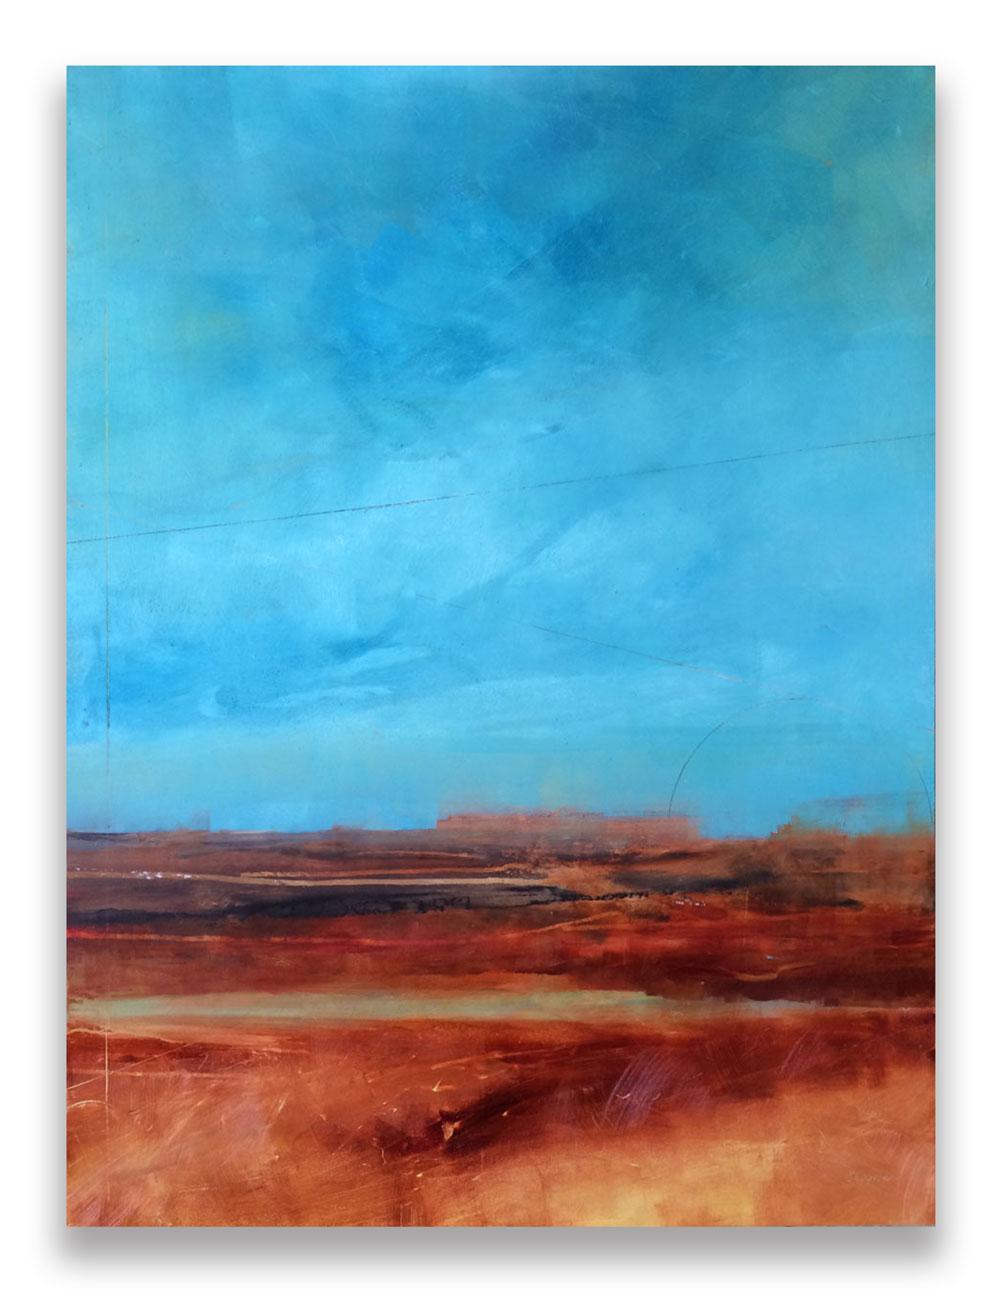 DAYBREAK |  SOLD   30 x 40 x 1.5  Oil on Wood Panel